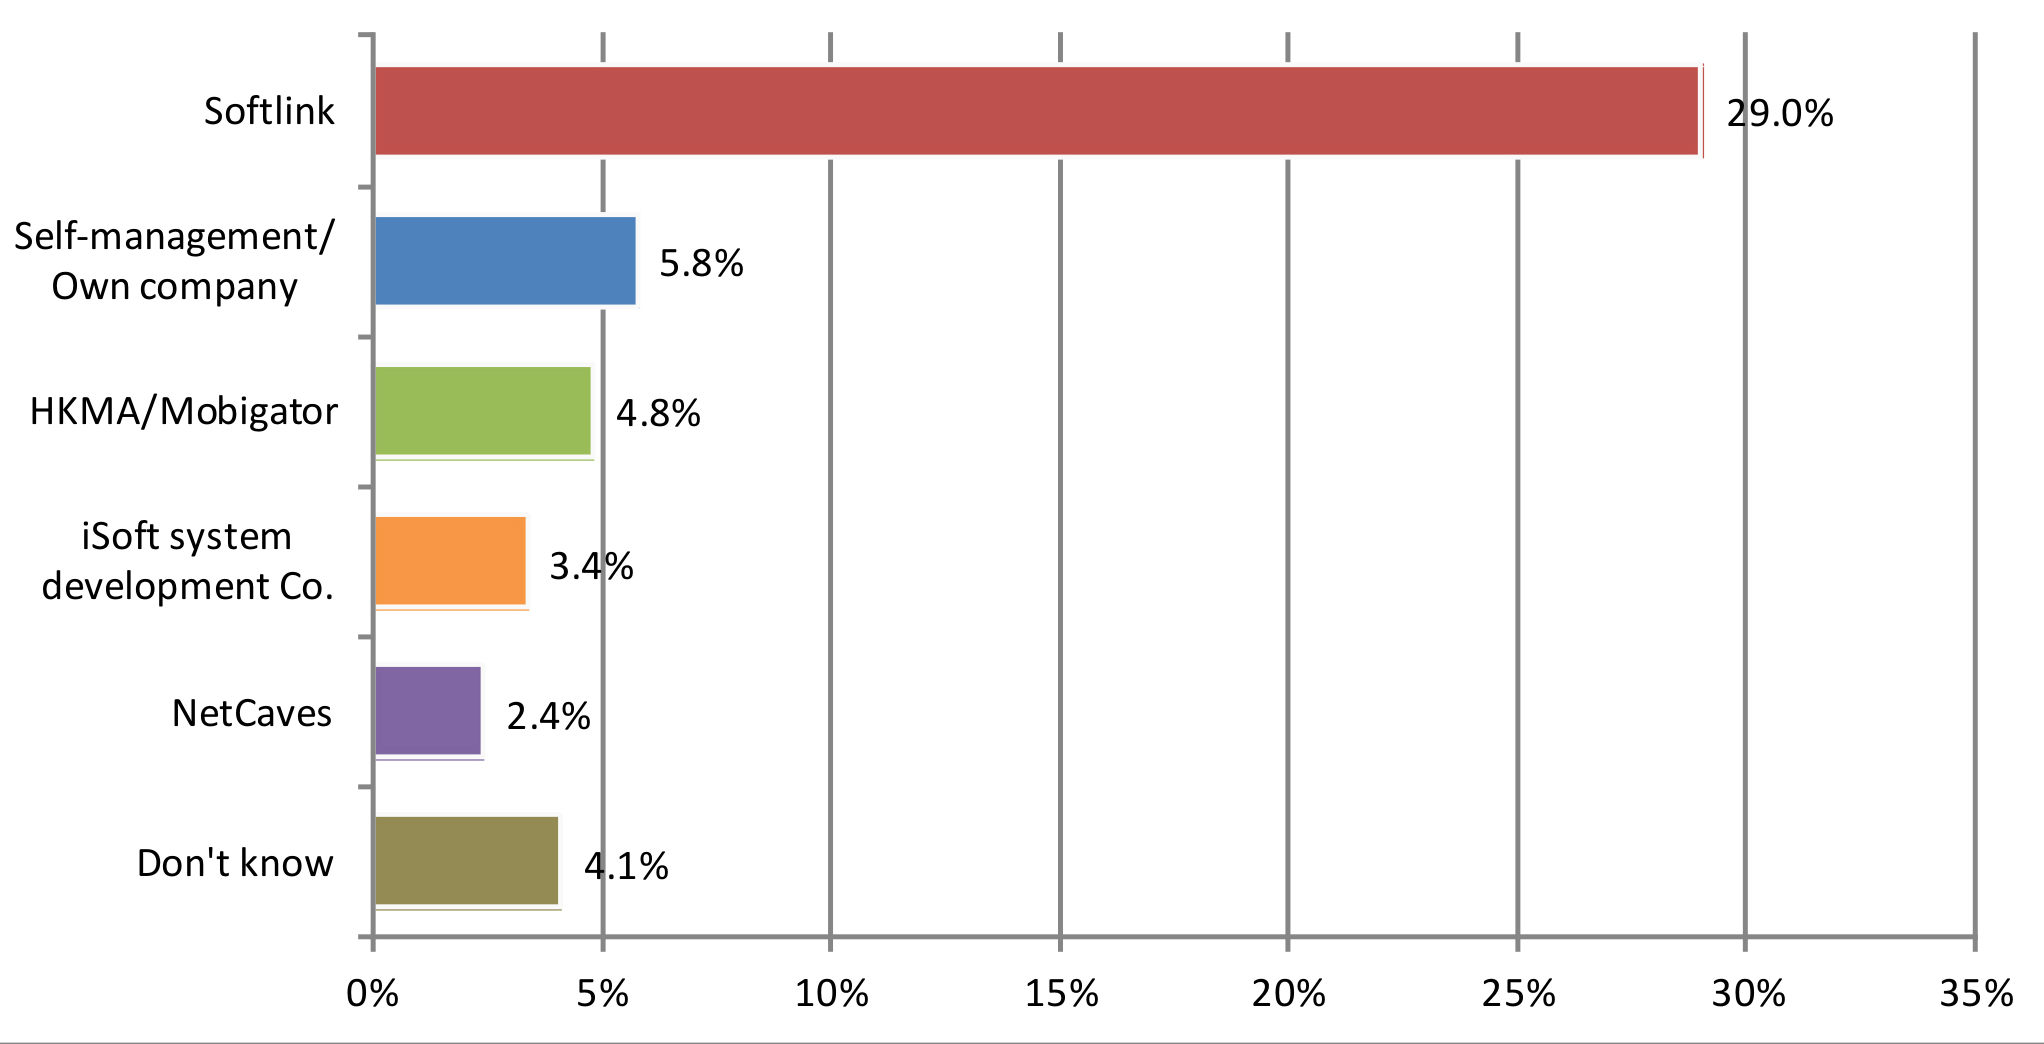 http://sotozenhamburg.de/library/ebook-%D0%BC%D1%96%D0%B6%D0%BD%D0%B0%D1%80%D0%BE%D0%B4%D0%BD%D0%B0-%D0%B5%D0%BA%D0%BE%D0%BD%D0%BE%D0%BC%D1%96%D0%BA%D0%B0-%D0%BD%D0%B0%D0%B2%D1%87-%D0%BF%D0%BE%D1%81%D1%96%D0%B1%D0%BD%D0%B8%D0%BA-2006/